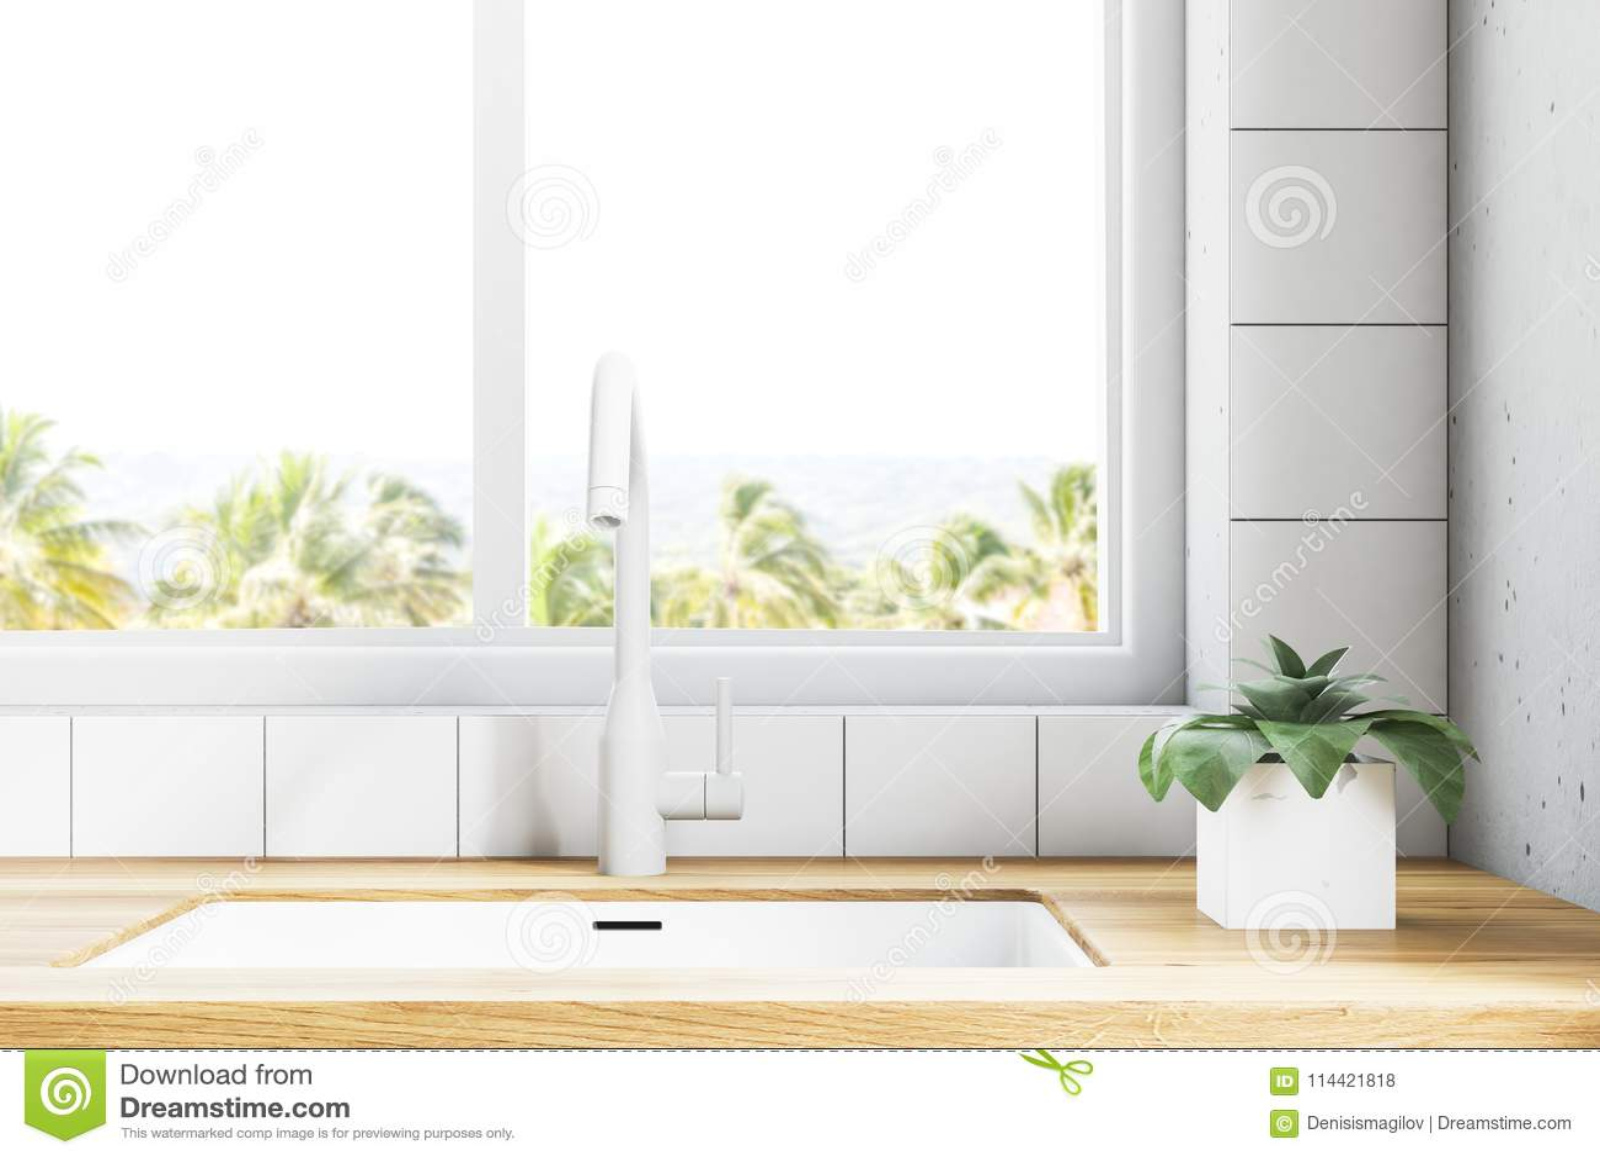 blanco kitchen sink make up air for residential hoods 在窗口附近的白色厨房水槽有热带看法库存例证 插画包括有龙头 国内 关闭在水槽与的一个木厨房工作台面修造的站立在与一处热带风景的一个大窗口下3d翻译嘲笑